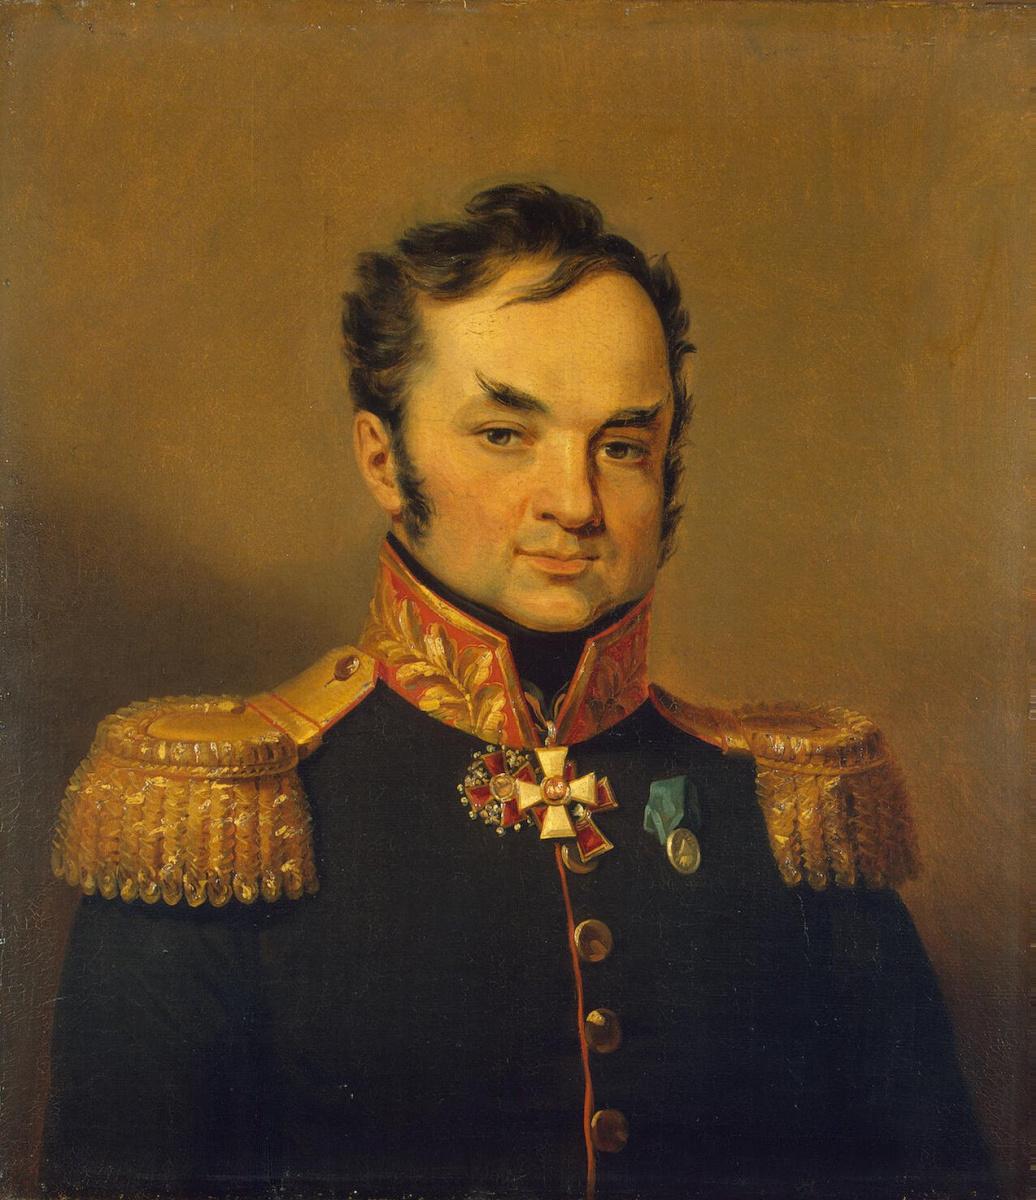 Джордж Доу. Портрет Андрея Саввича Глебова